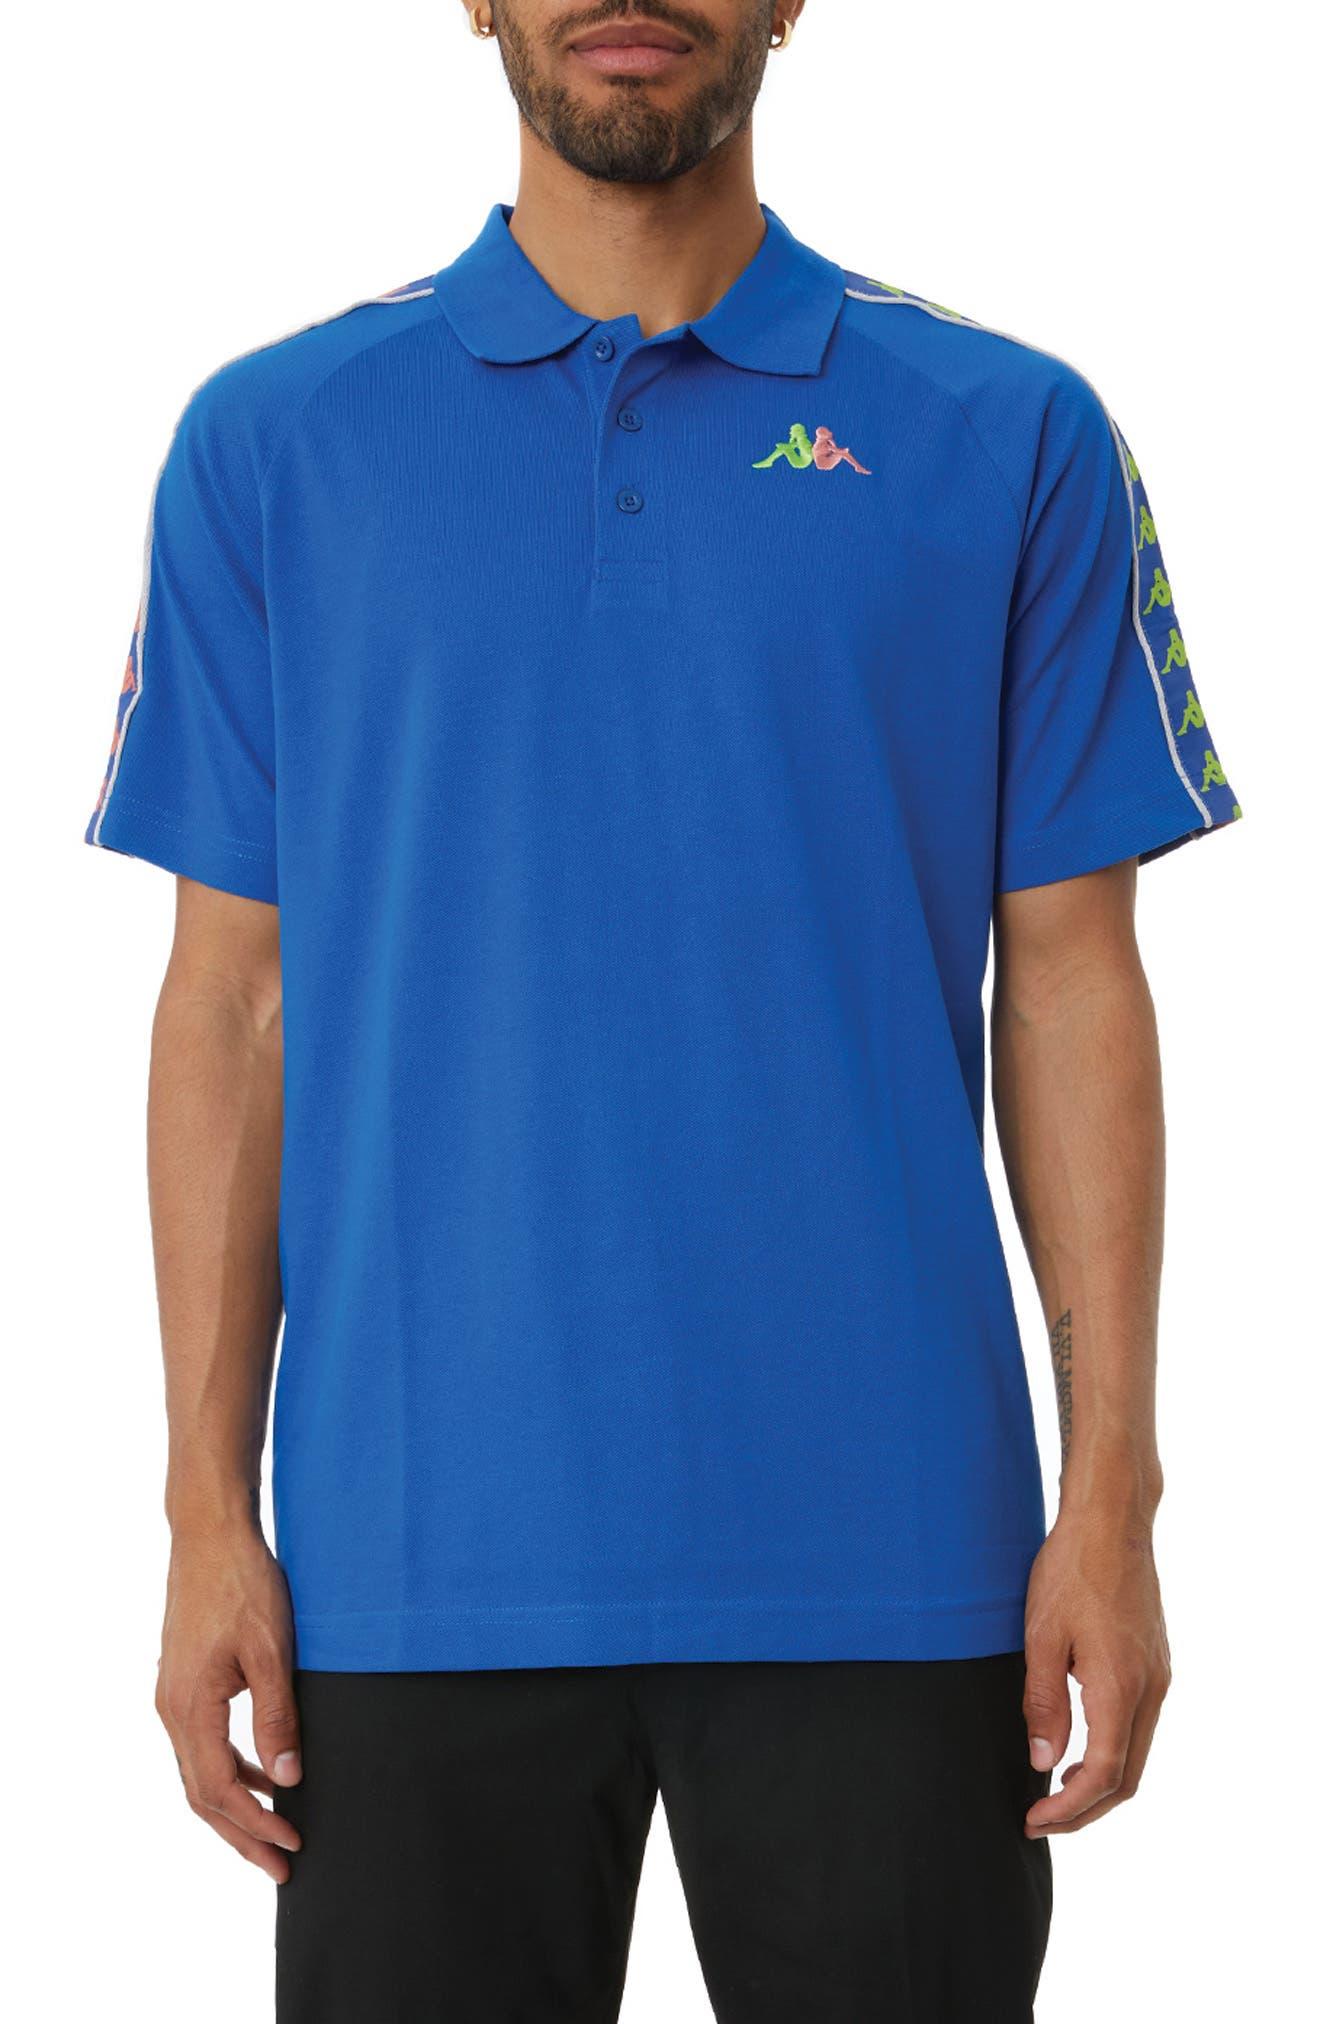 222 Banda Linstead Polo Shirt